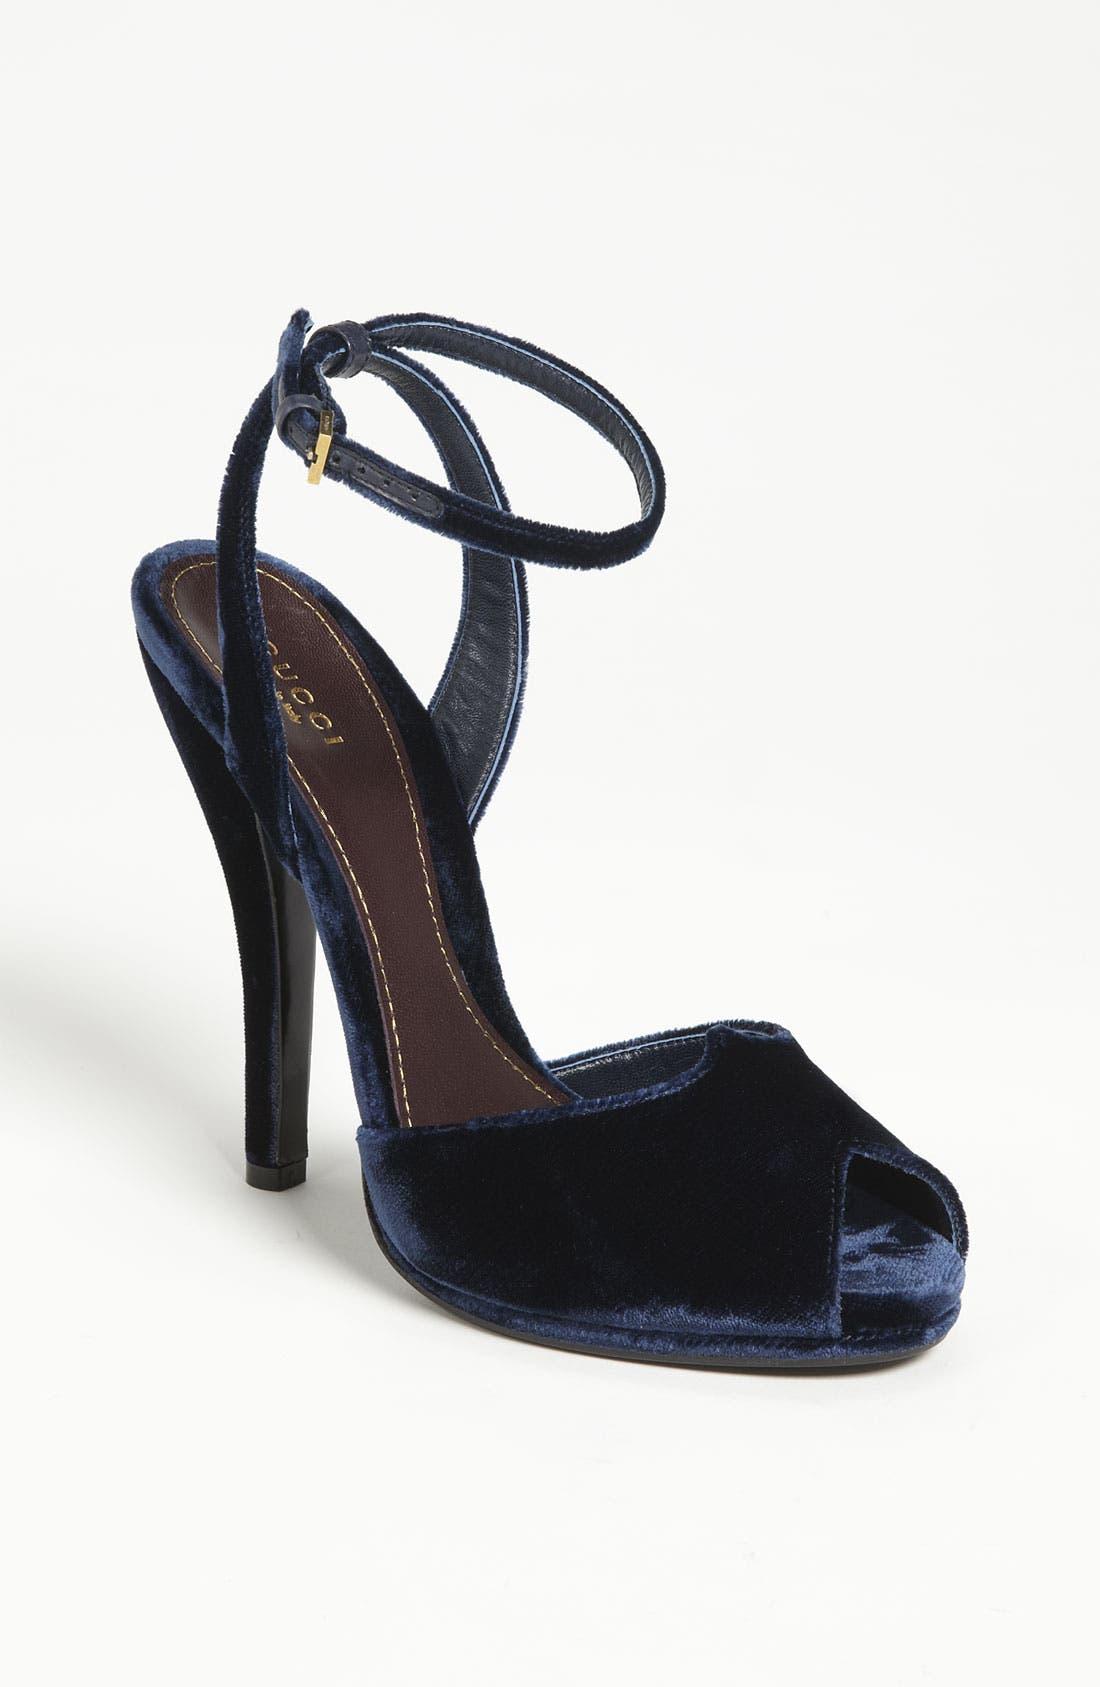 Main Image - Gucci Ankle Strap Sandal